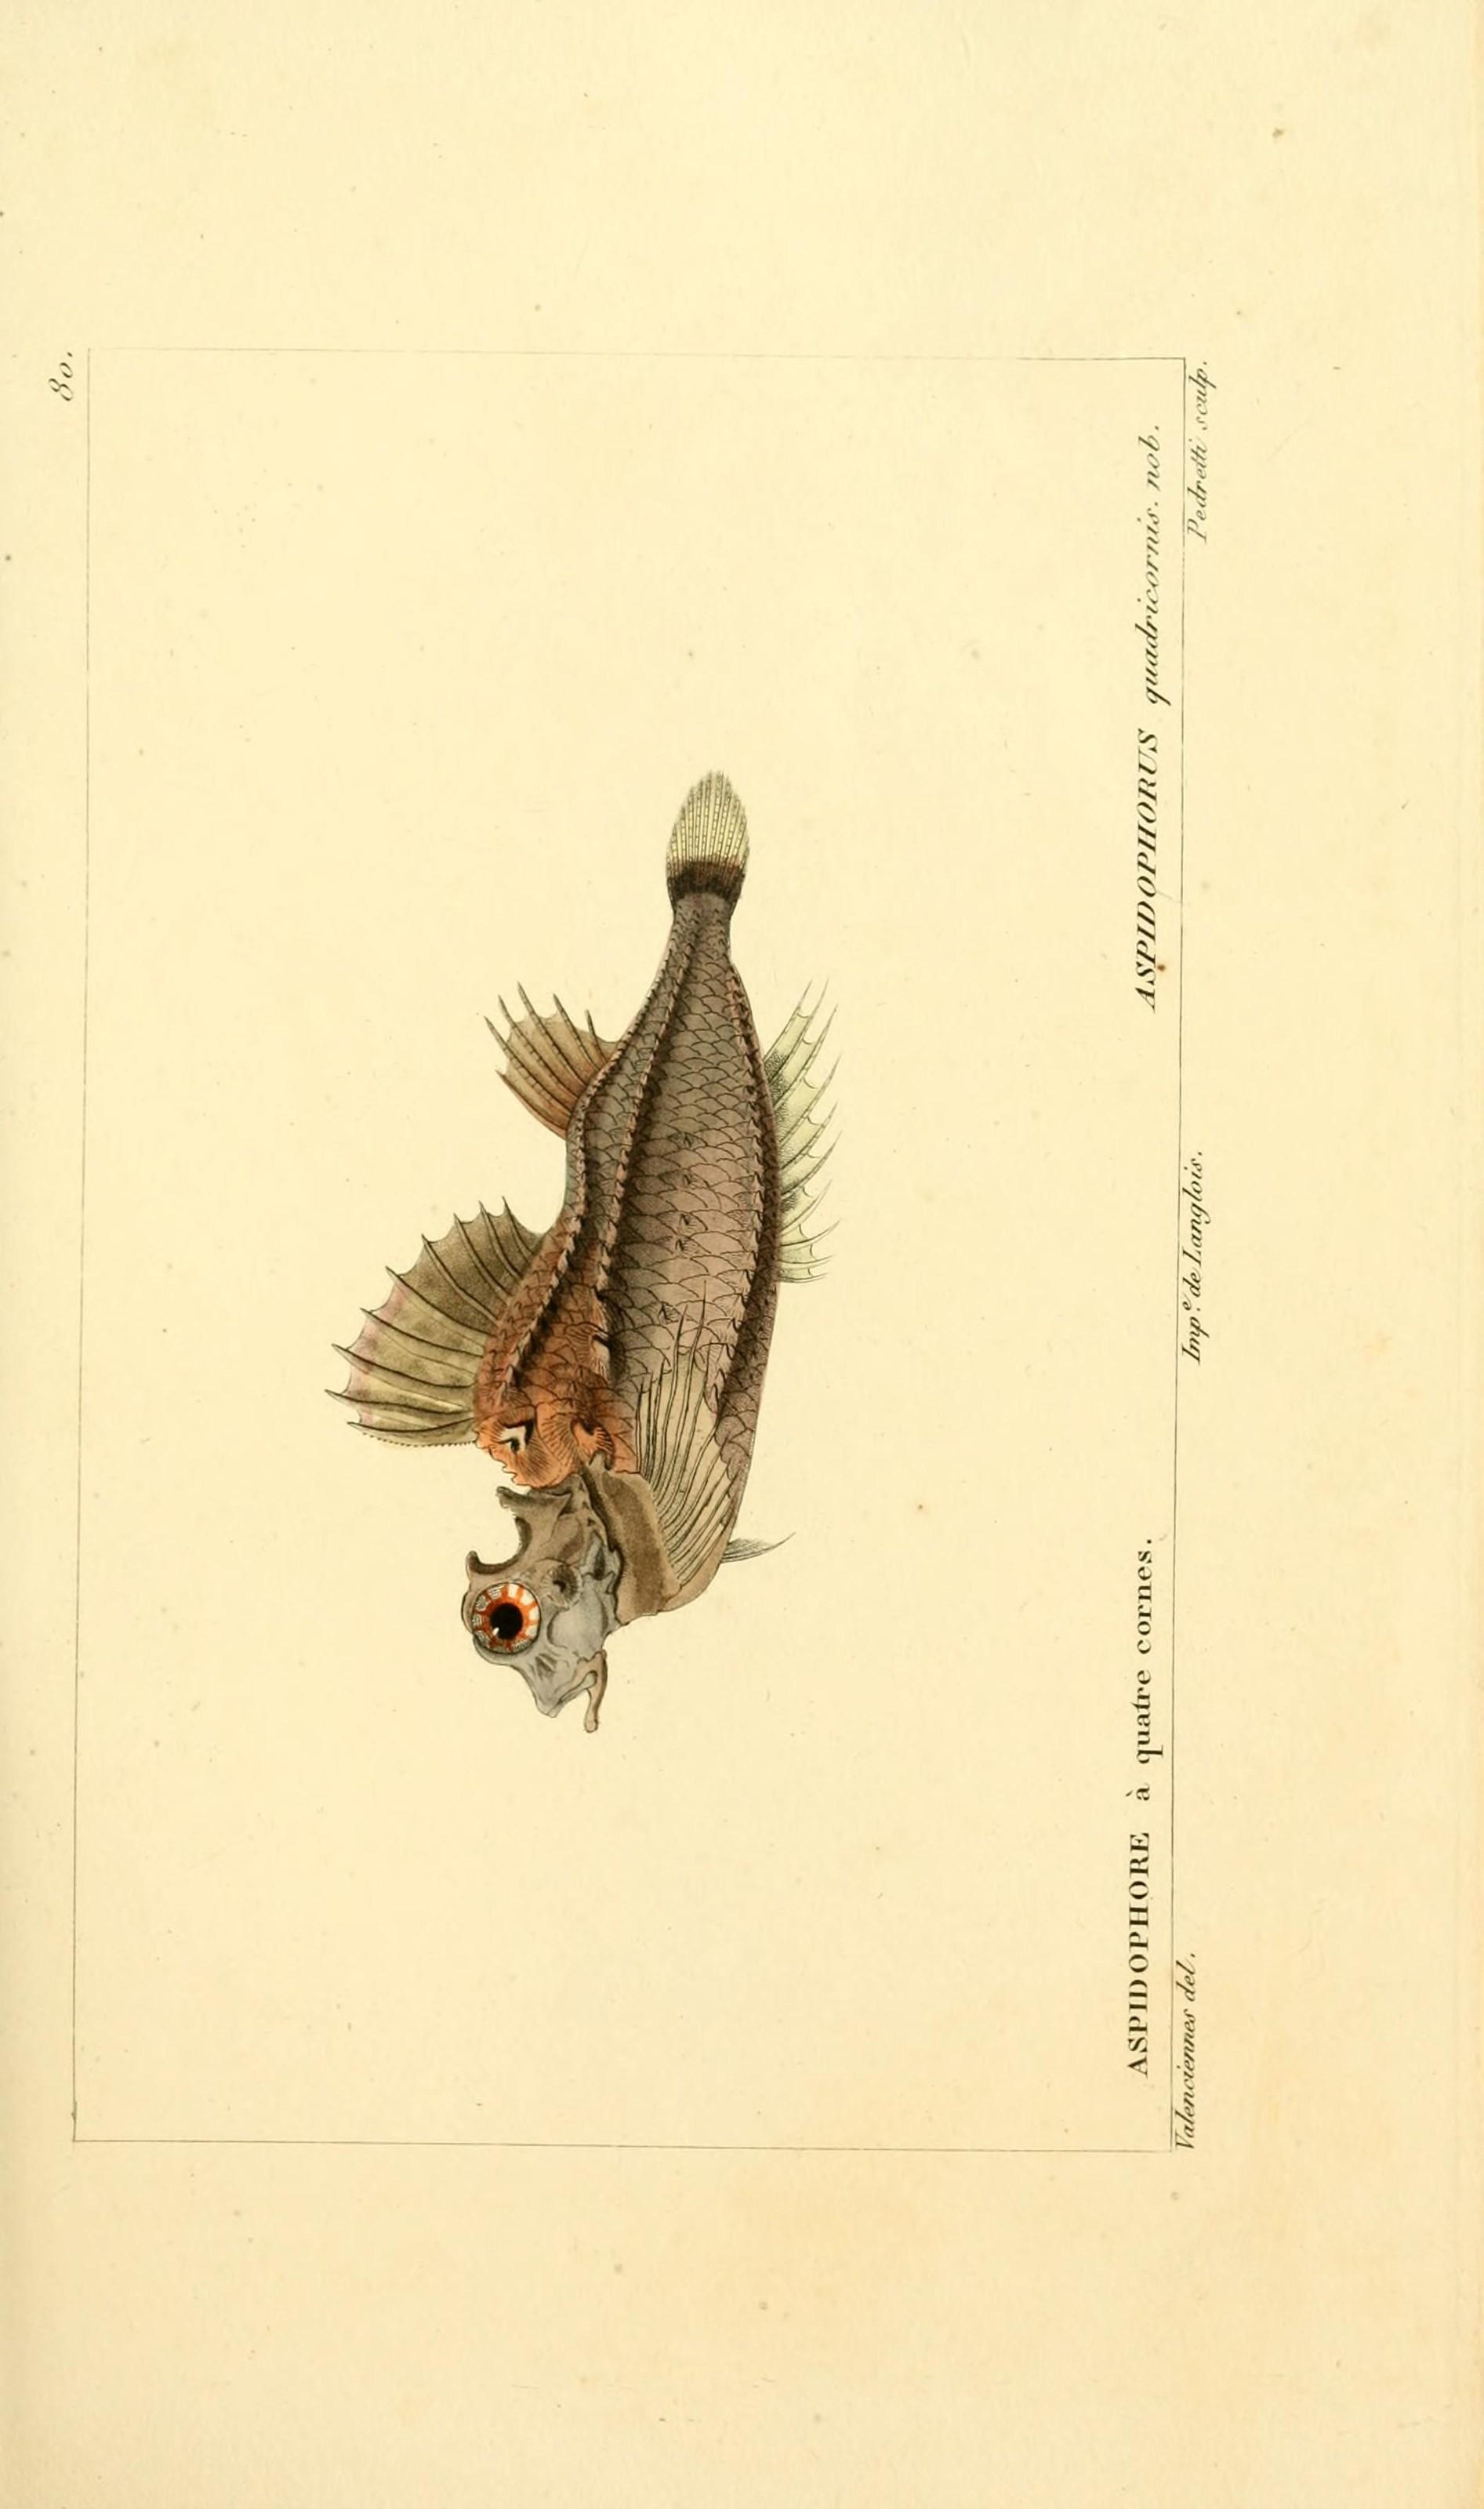 Image of fourhorn poacher